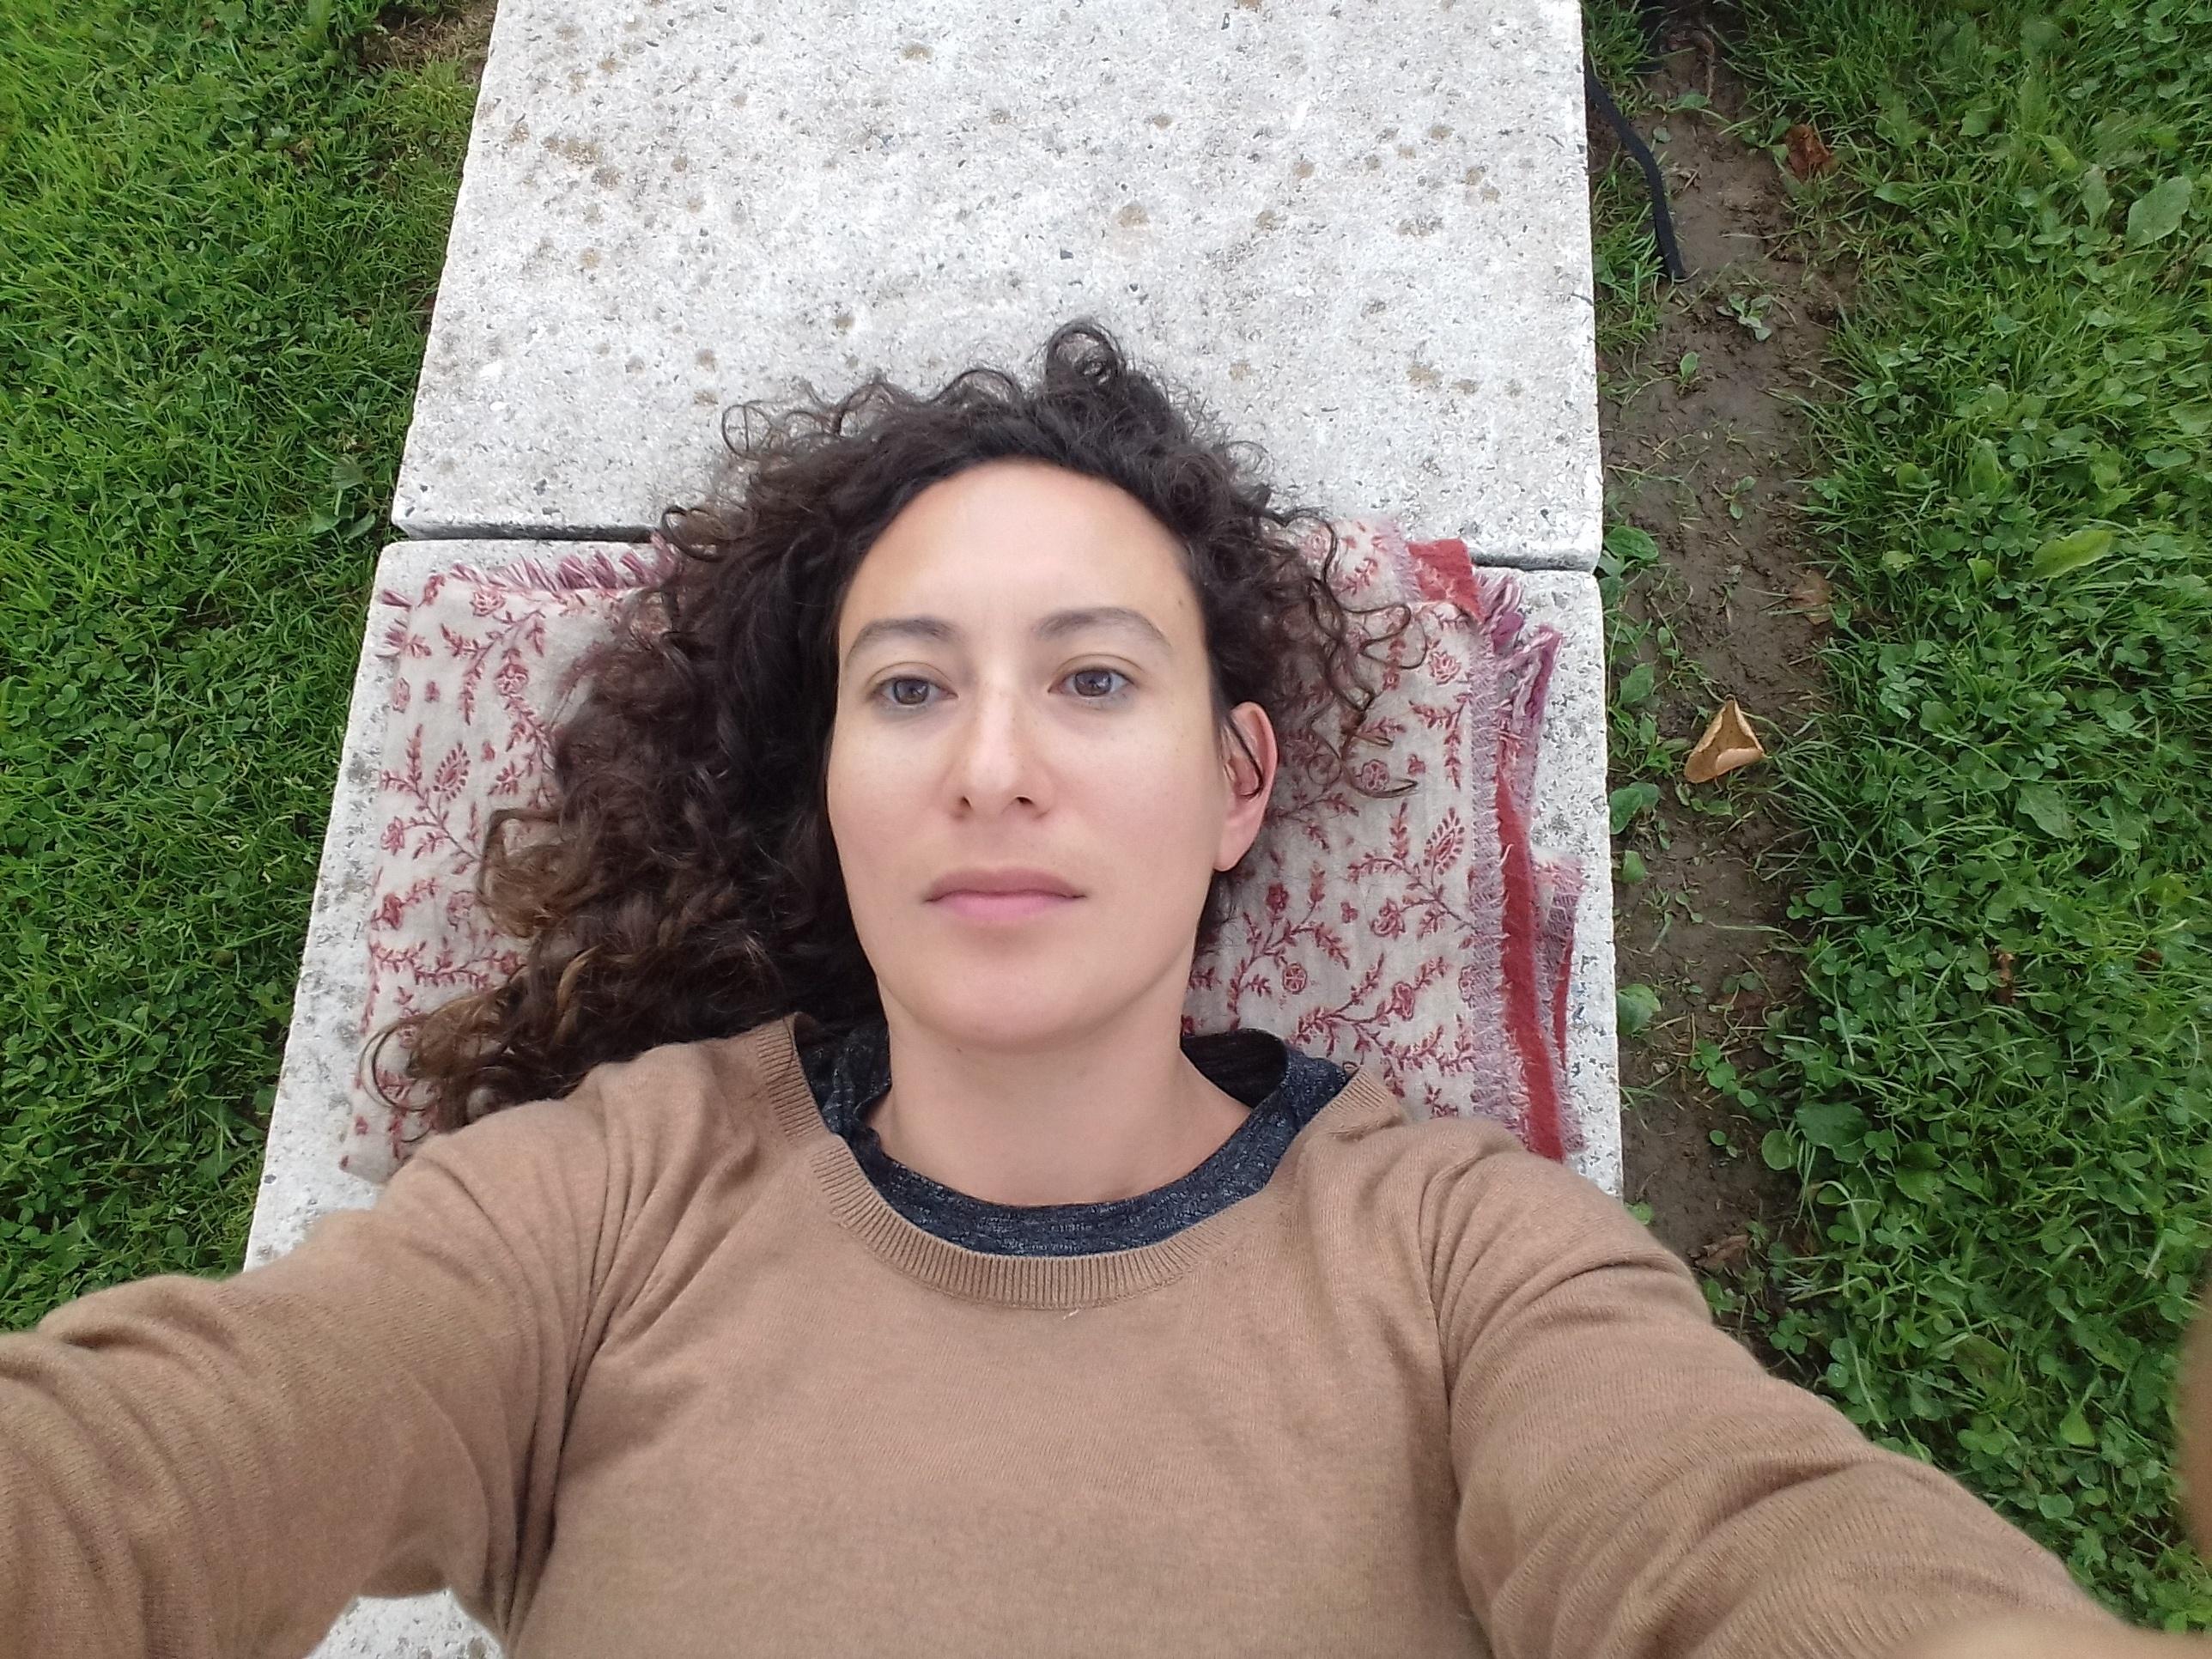 Headshot of Raquel Meseguer |Photo Credits Raquel Meseguer